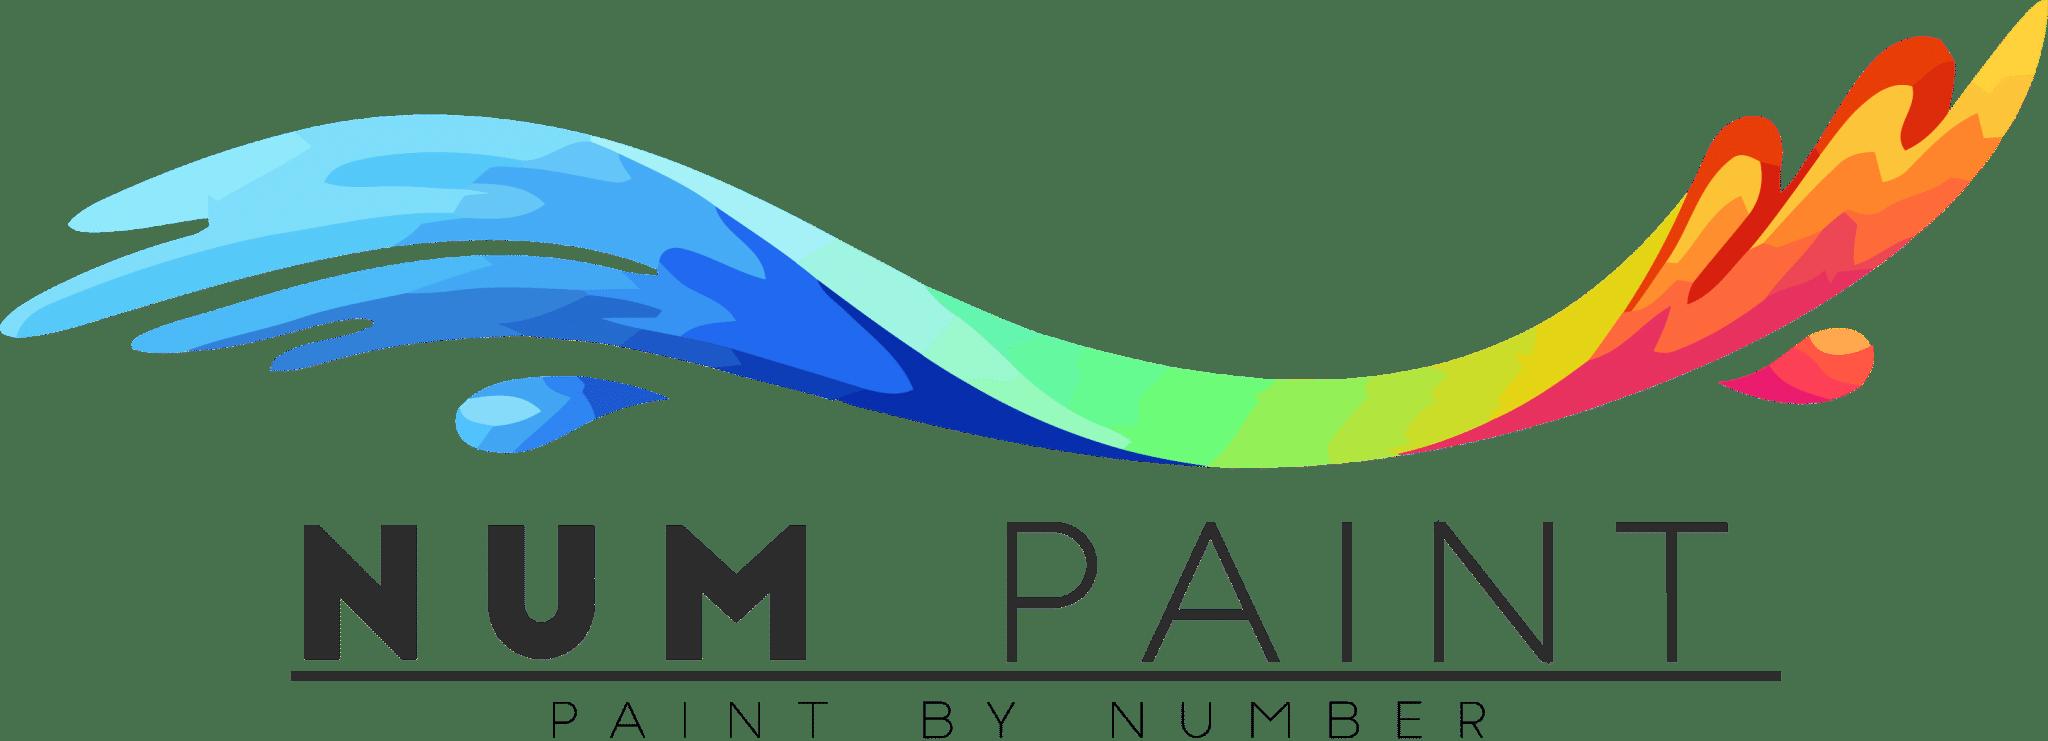 NumPaint – Paint by numbers